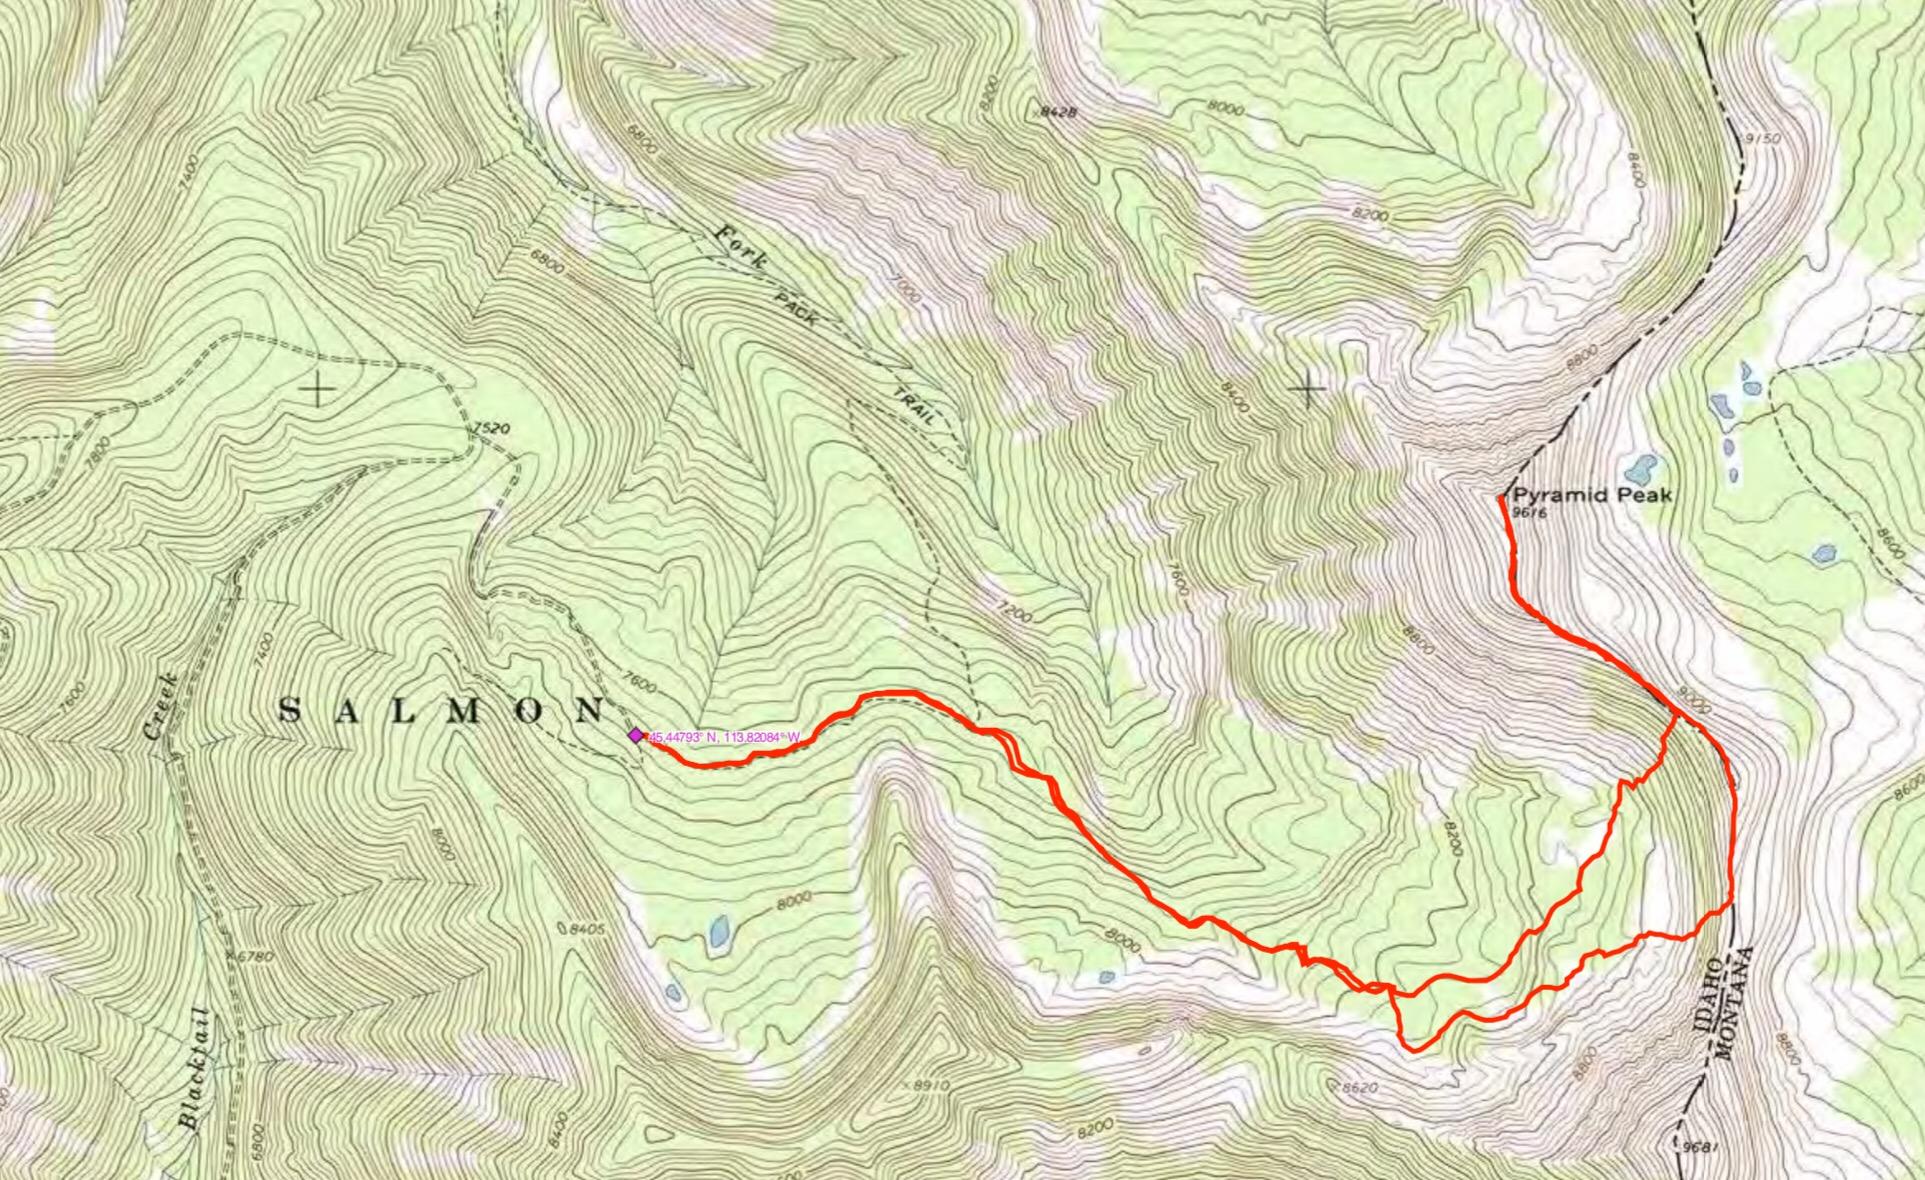 John Platt's GPS track. John measured the route as 7.5 miles with 2,335 feet of gain round trip.